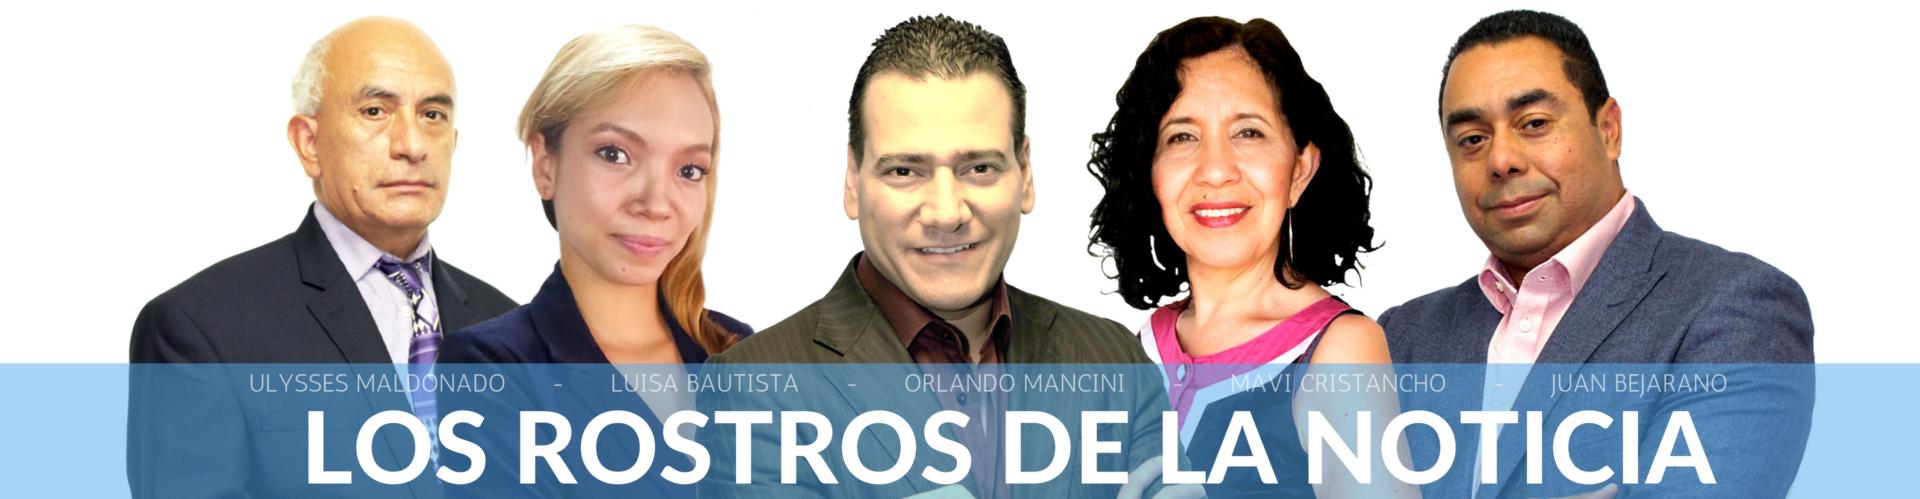 Uniendo a toda la comunidad hispana del Reino Unido